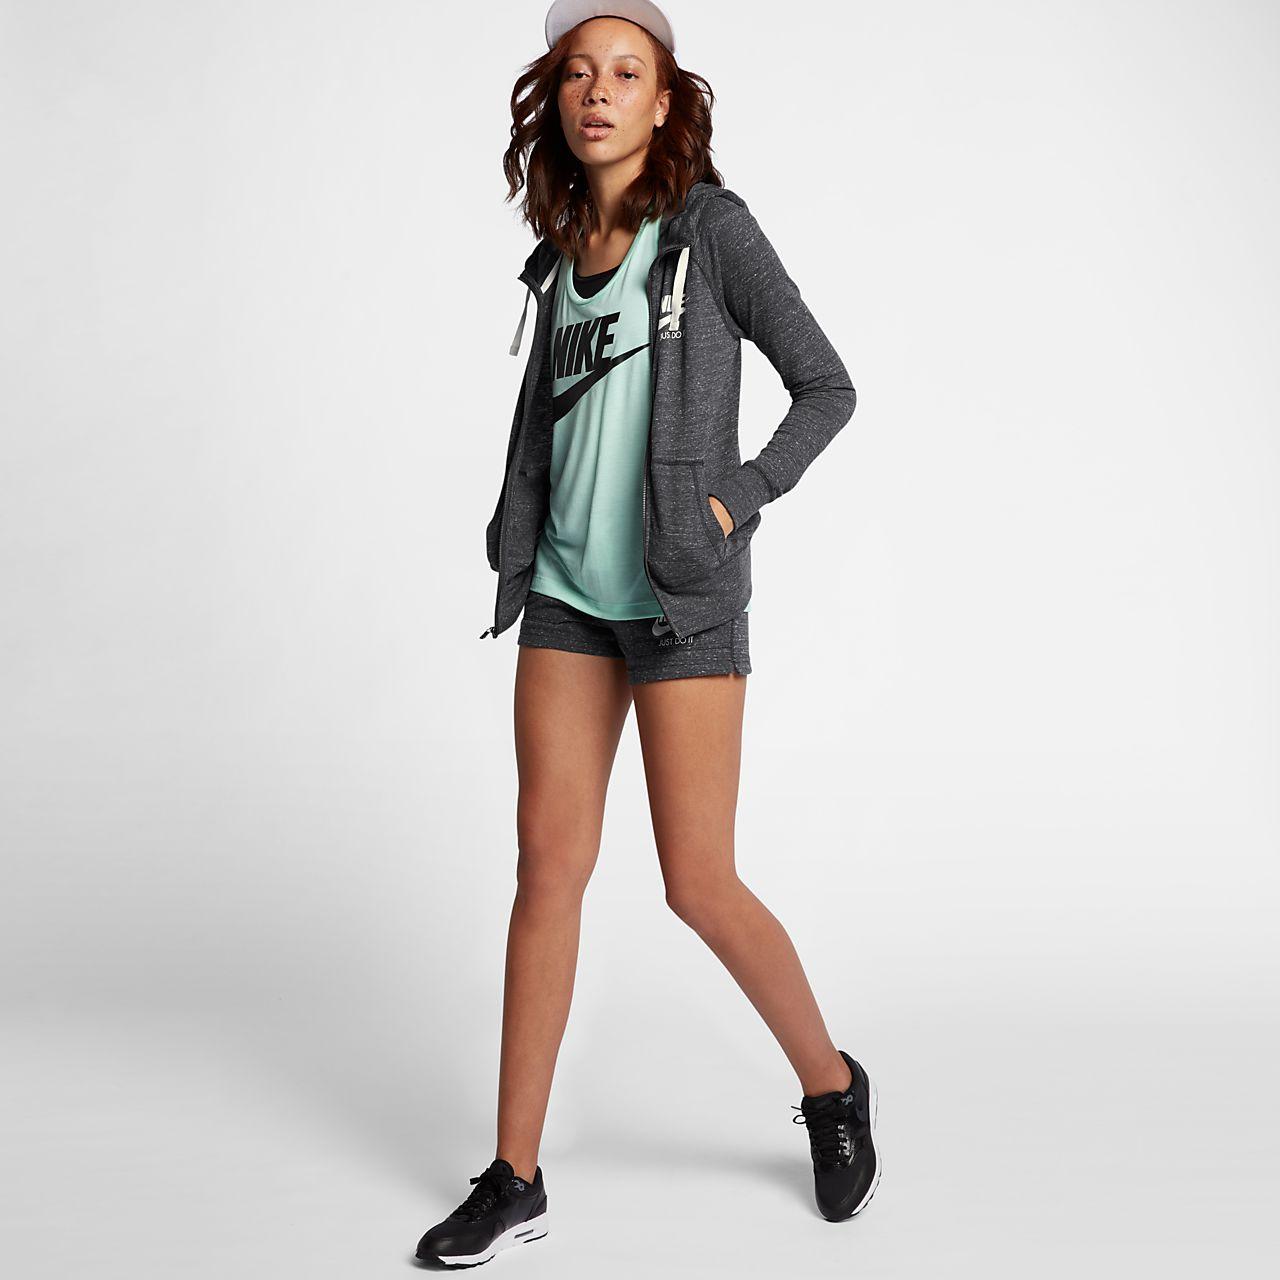 separation shoes 10d61 c3ec7 ... Huvtröja med hel dragkedja Nike Sportswear Gym Vintage för kvinnor